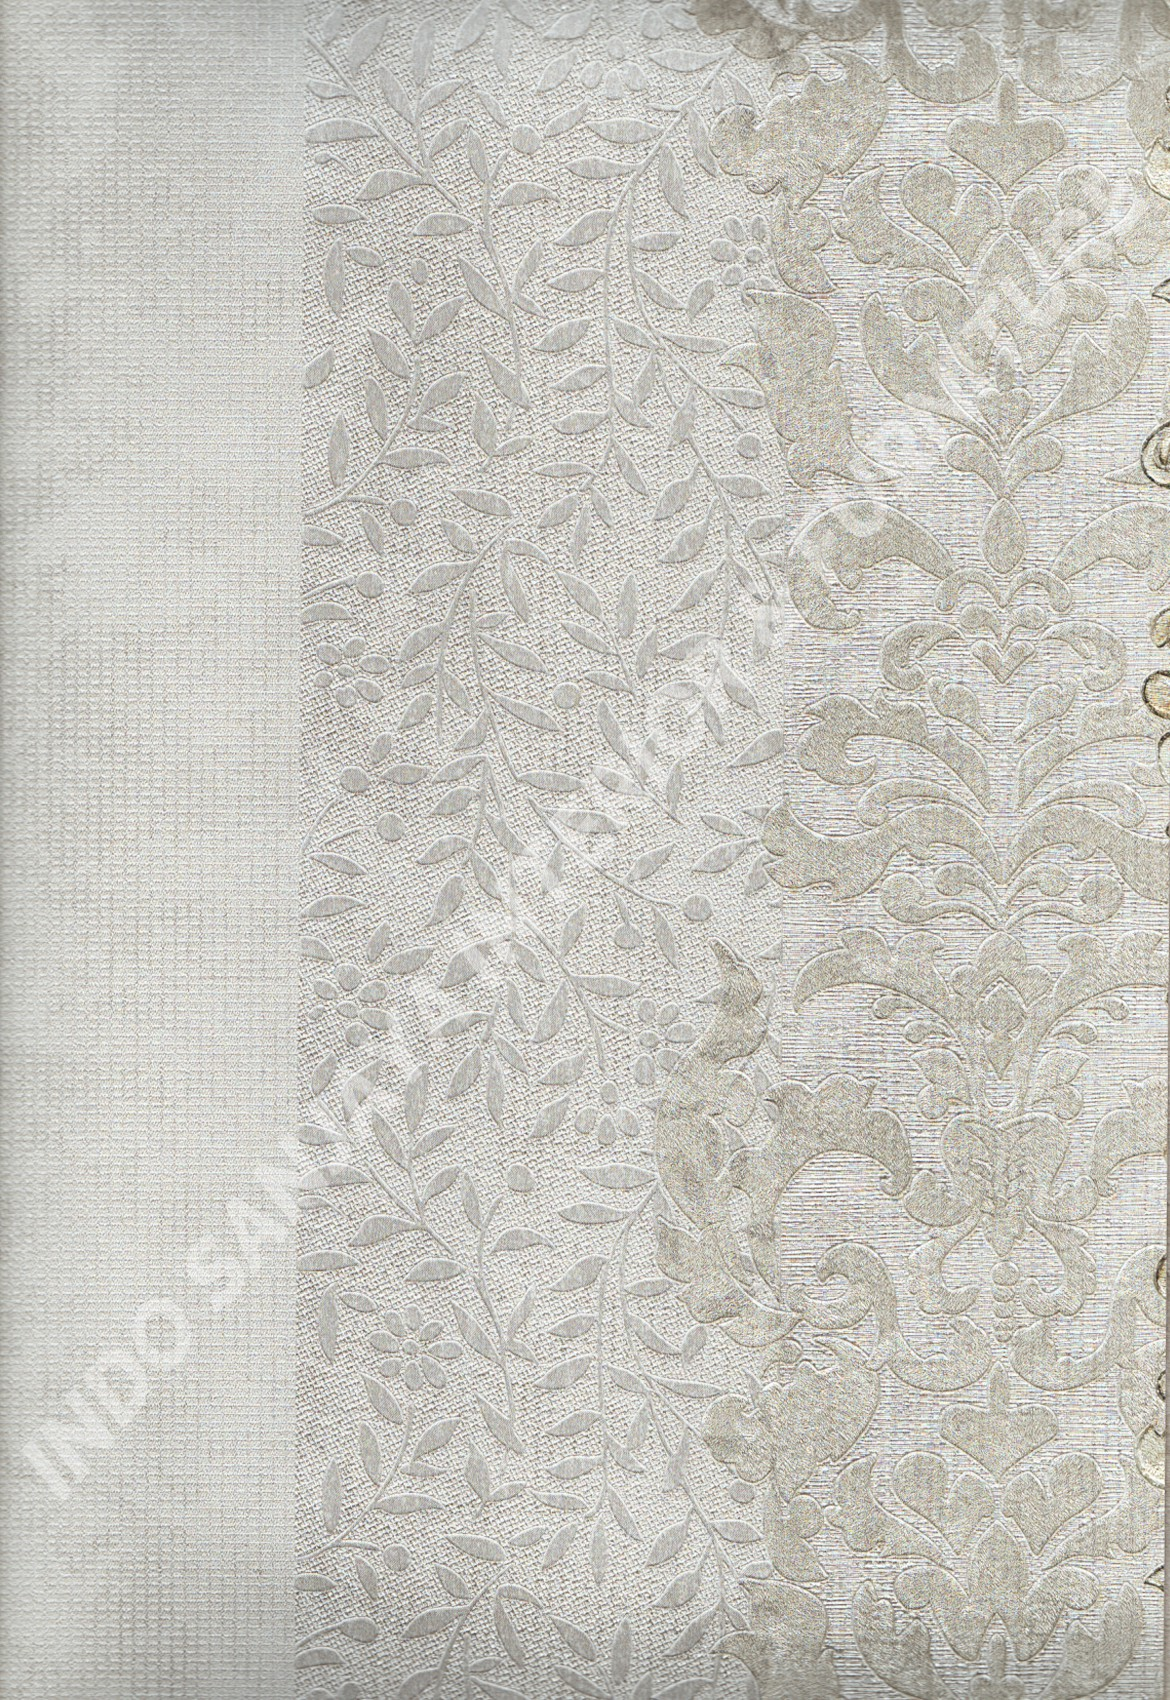 wallpaper   Wallpaper Klasik Batik (Damask) DL11905:DL11905 corak  warna